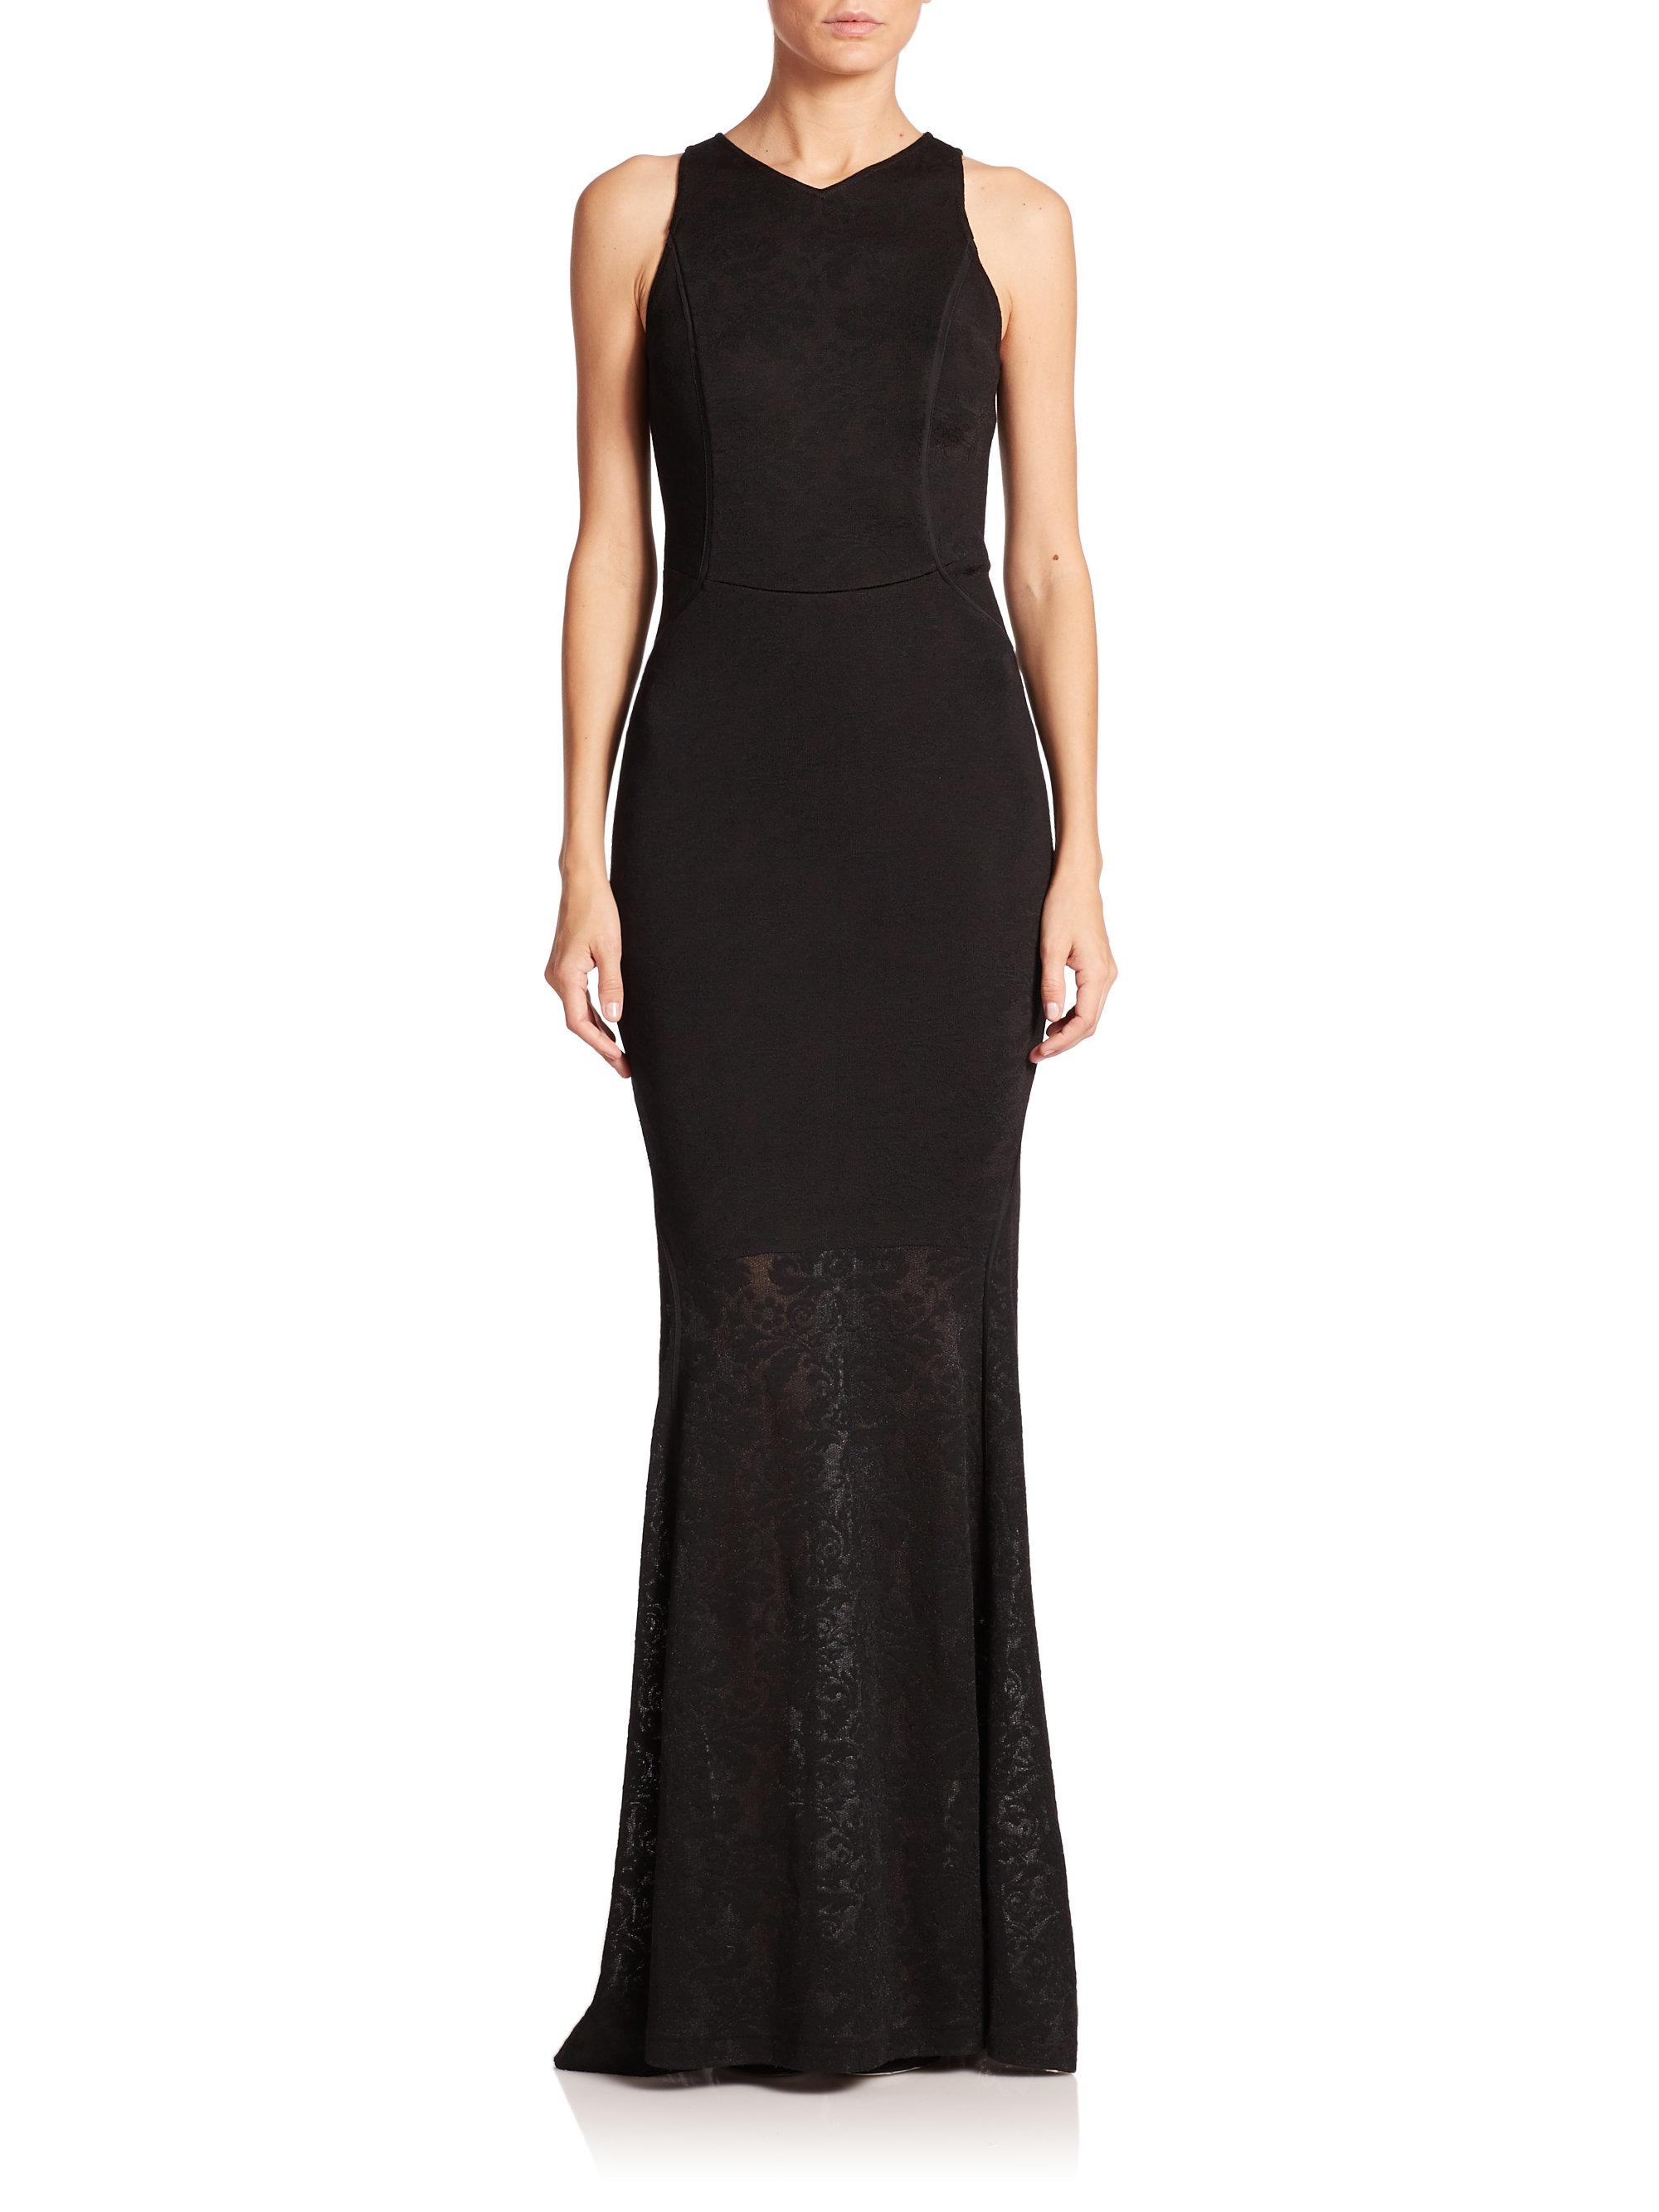 aca0e253e024 Lyst - St. John Jacquard Knit Gown in Black